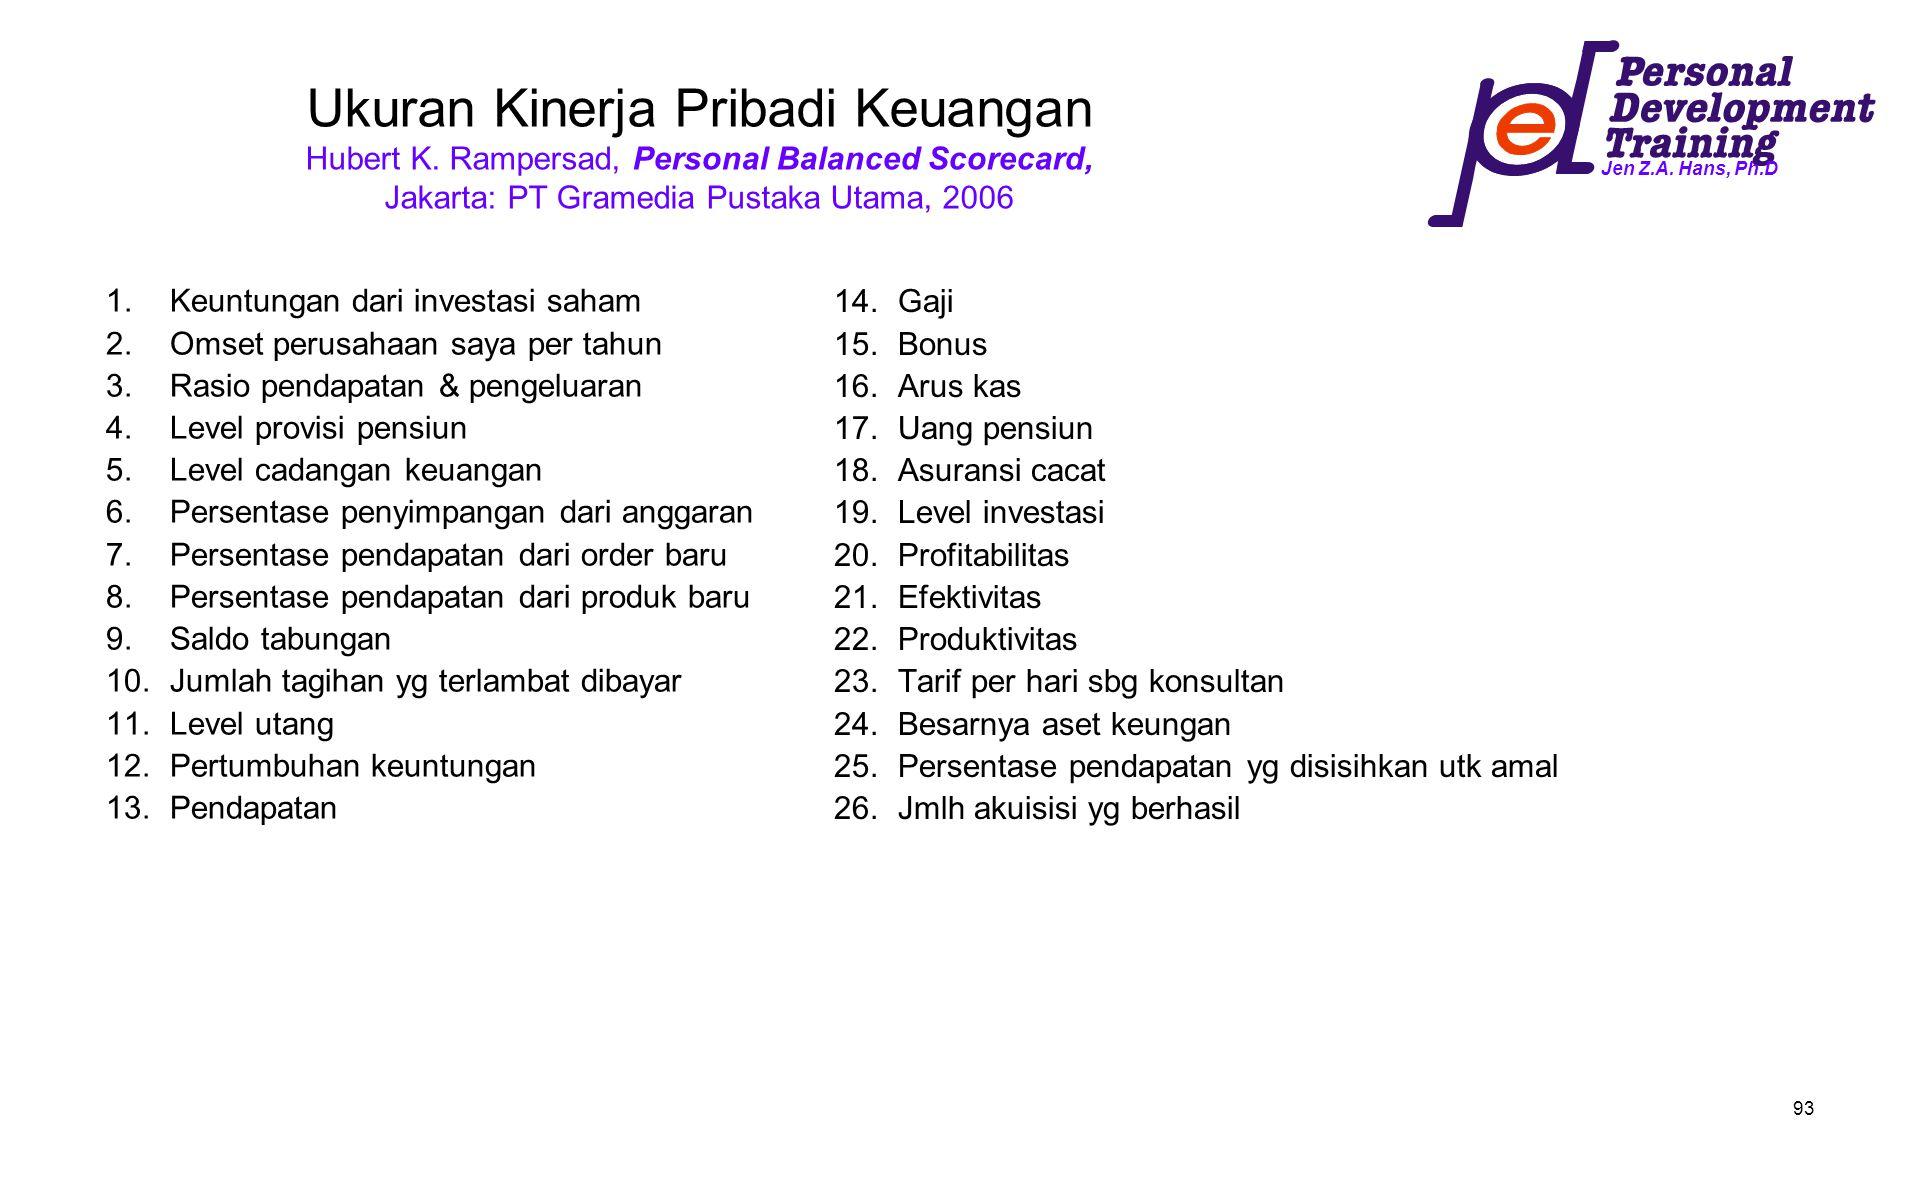 Jen Z.A. Hans, Ph.D 93 Ukuran Kinerja Pribadi Keuangan Hubert K. Rampersad, Personal Balanced Scorecard, Jakarta: PT Gramedia Pustaka Utama, 2006 1.Ke